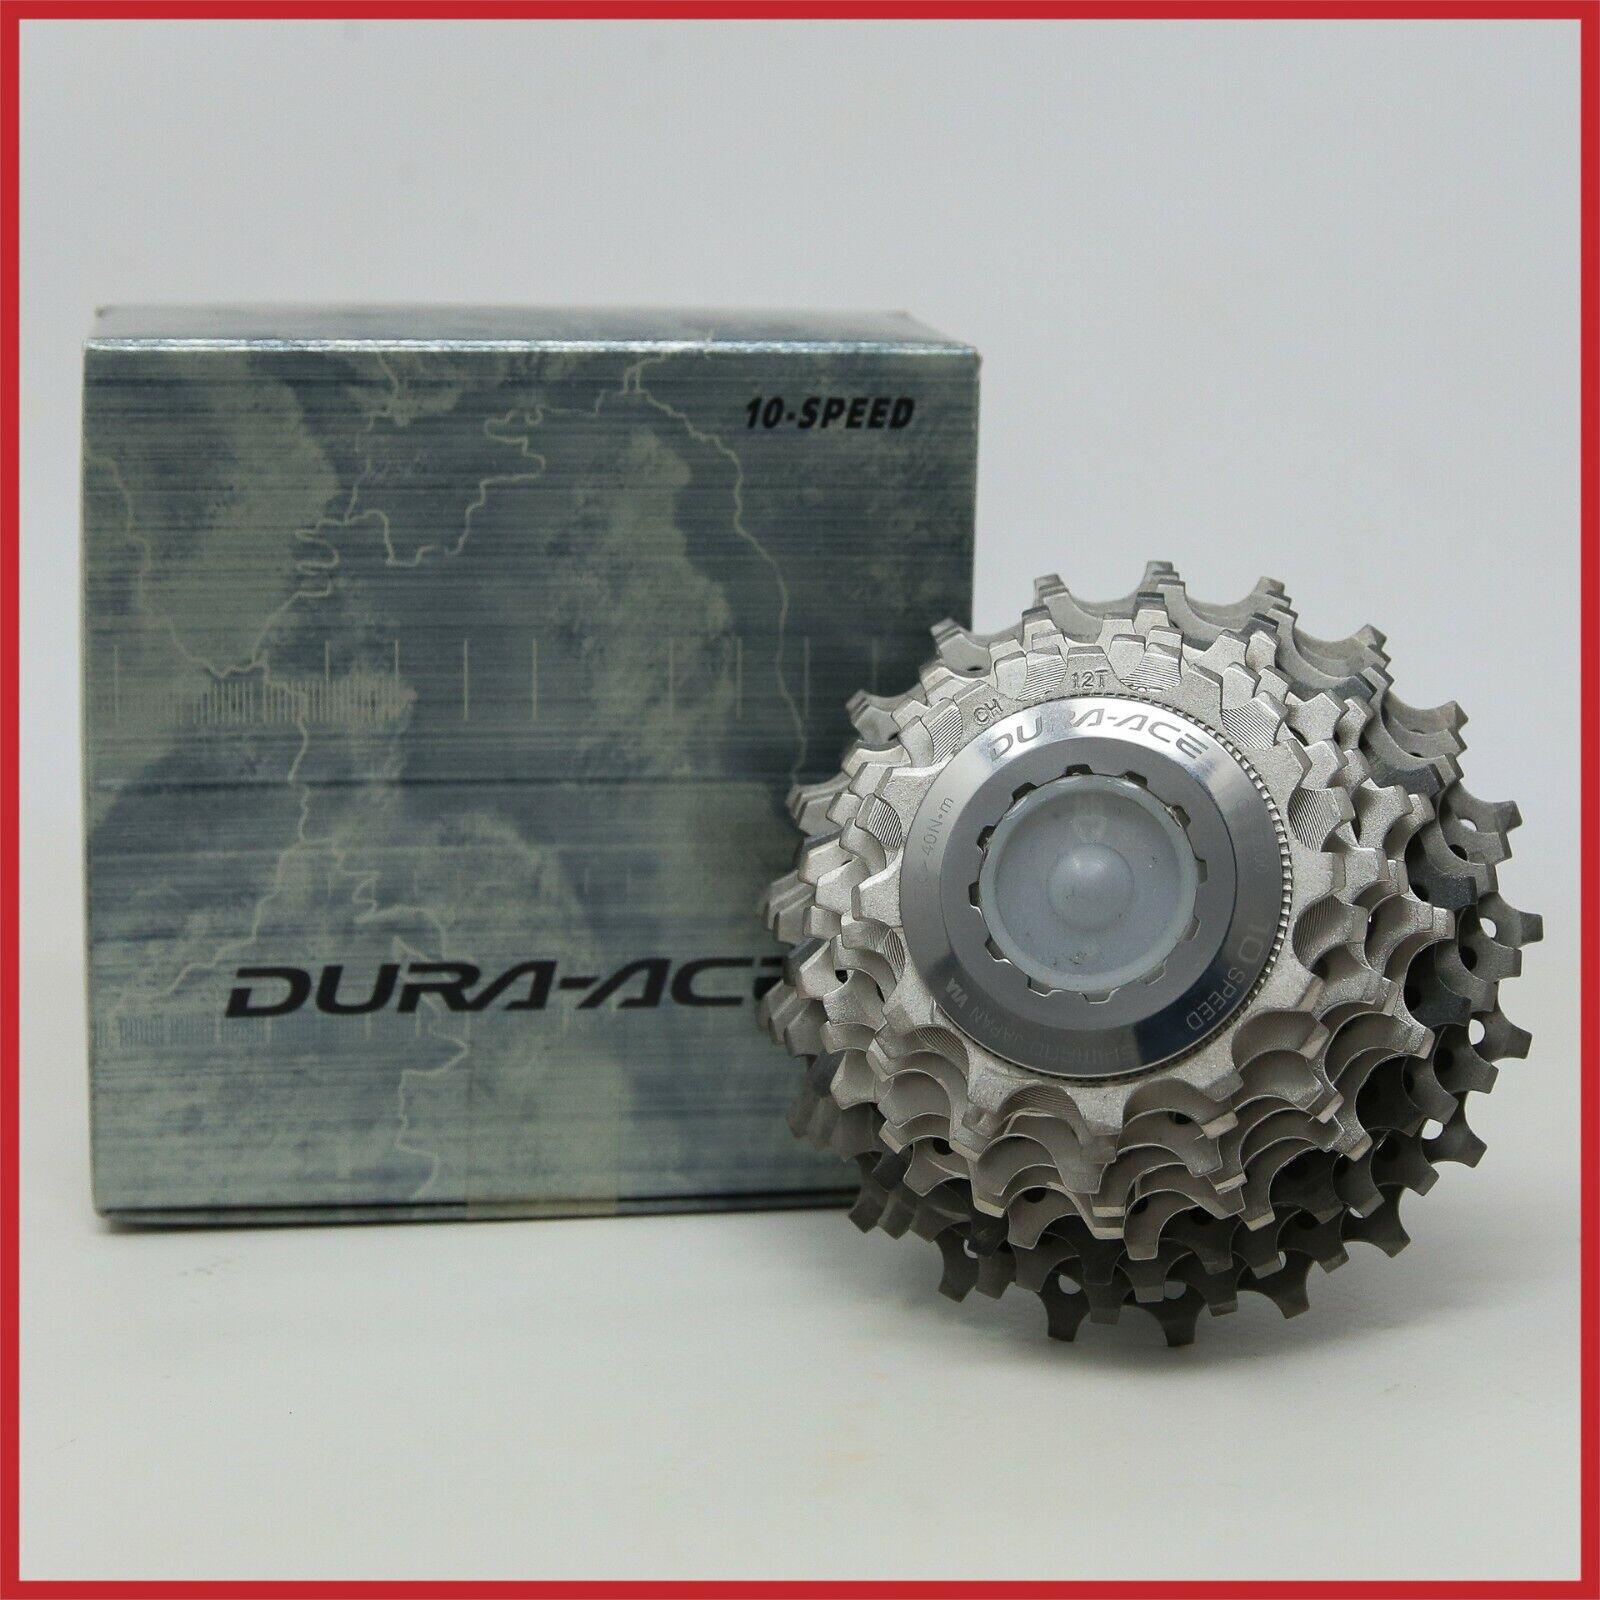 NOS SHIMANO DURA-ACE TITANIUM HG CASSETTE CS-7800 12-21 T 10s SPEED VINTAGE ROAD